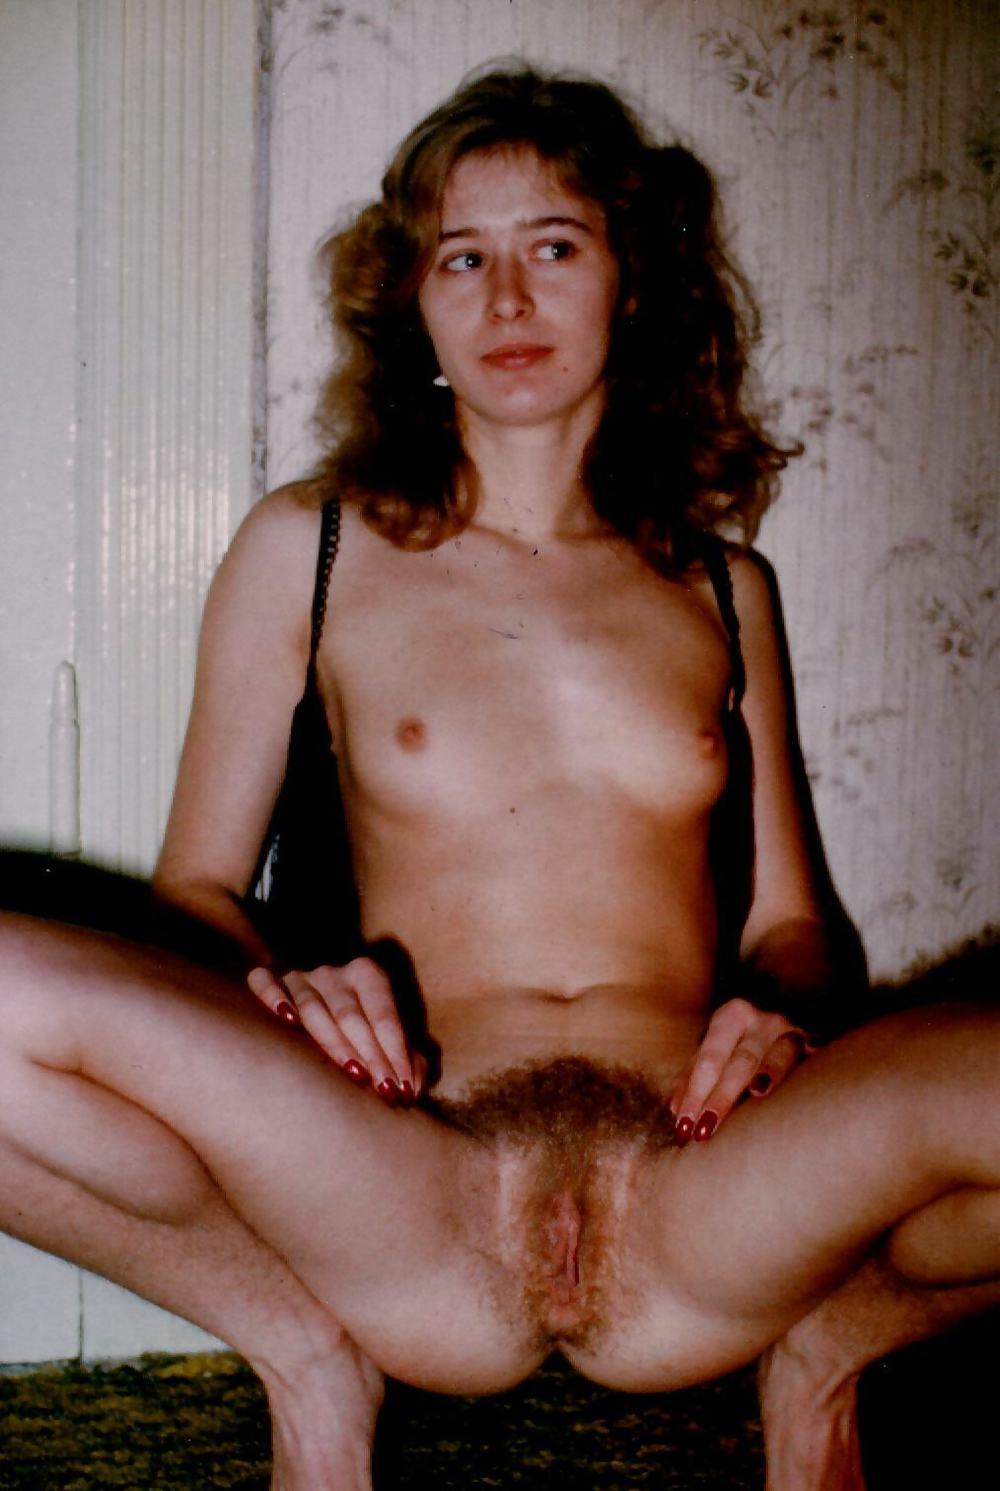 Vintage Erotica Petite Girl, Hairy Pussy, Retro Doggystyle